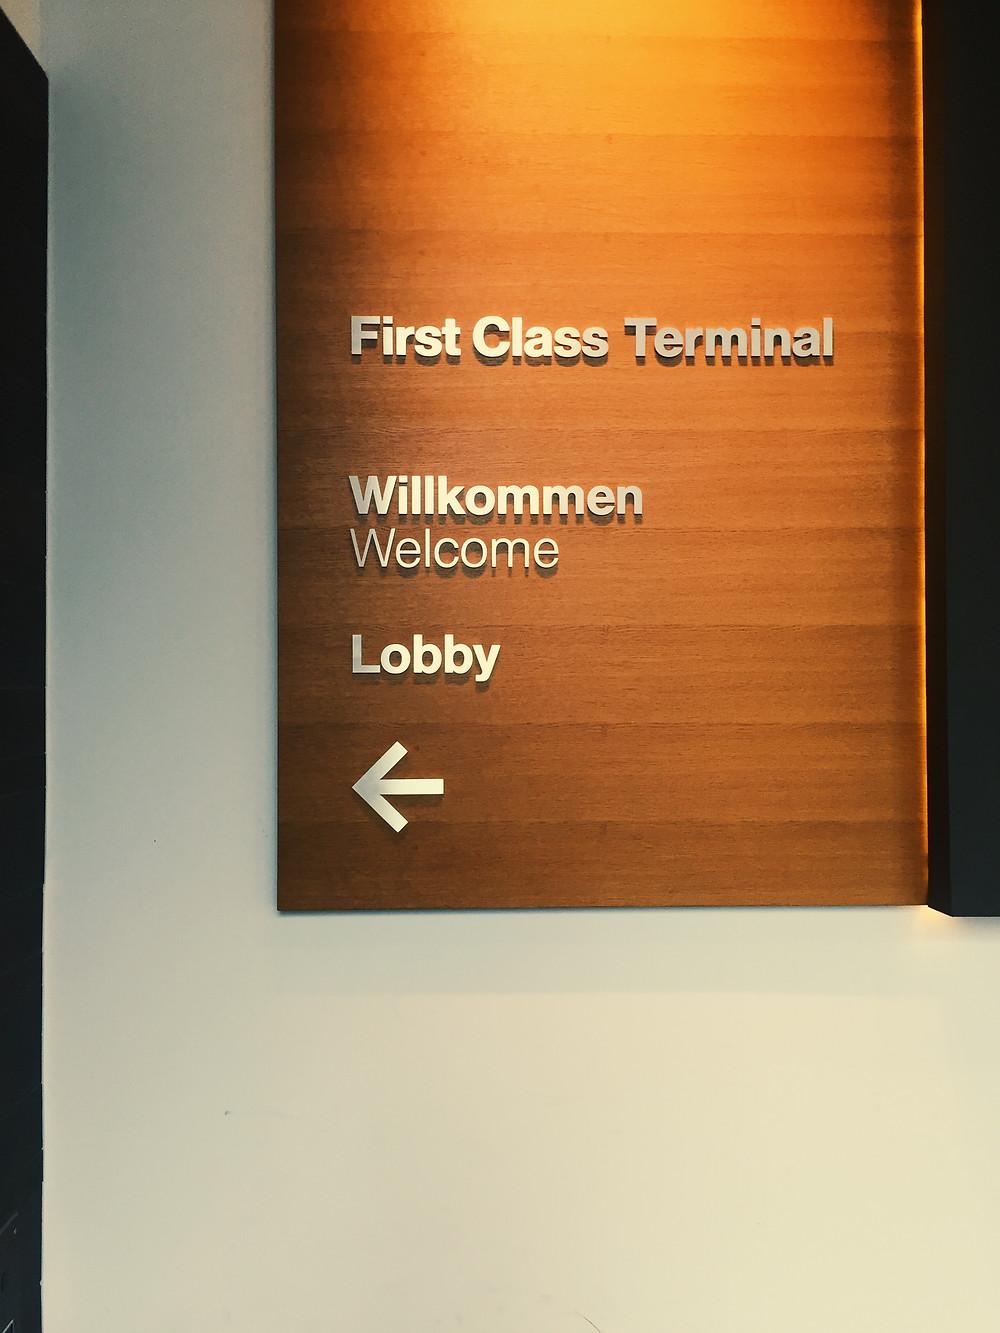 Lufthansa First Class Terminal, Ground Floor Lobby